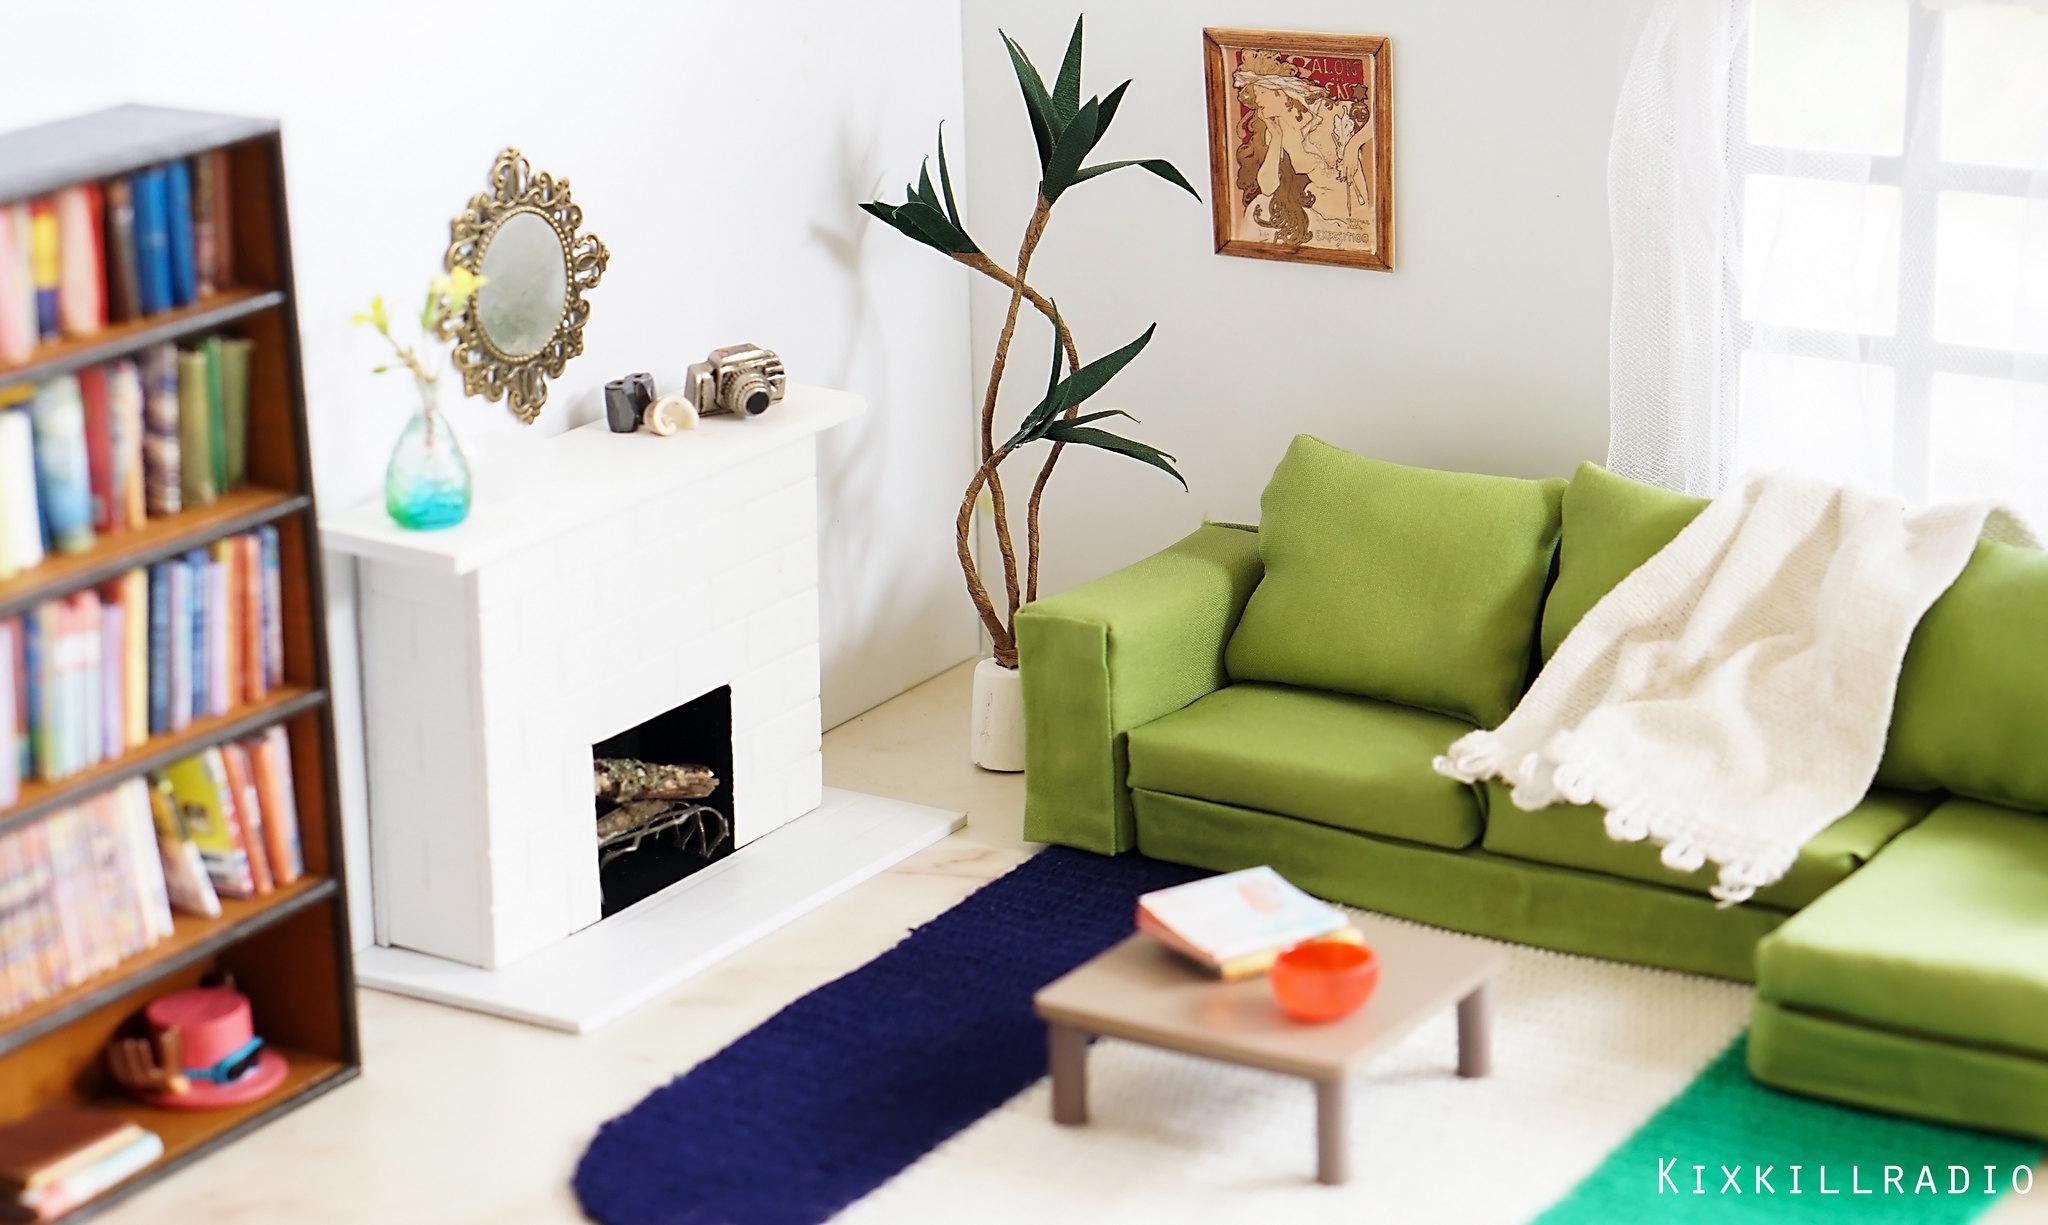 Miniature Living Room Set for Toy Photography – kixkillradio